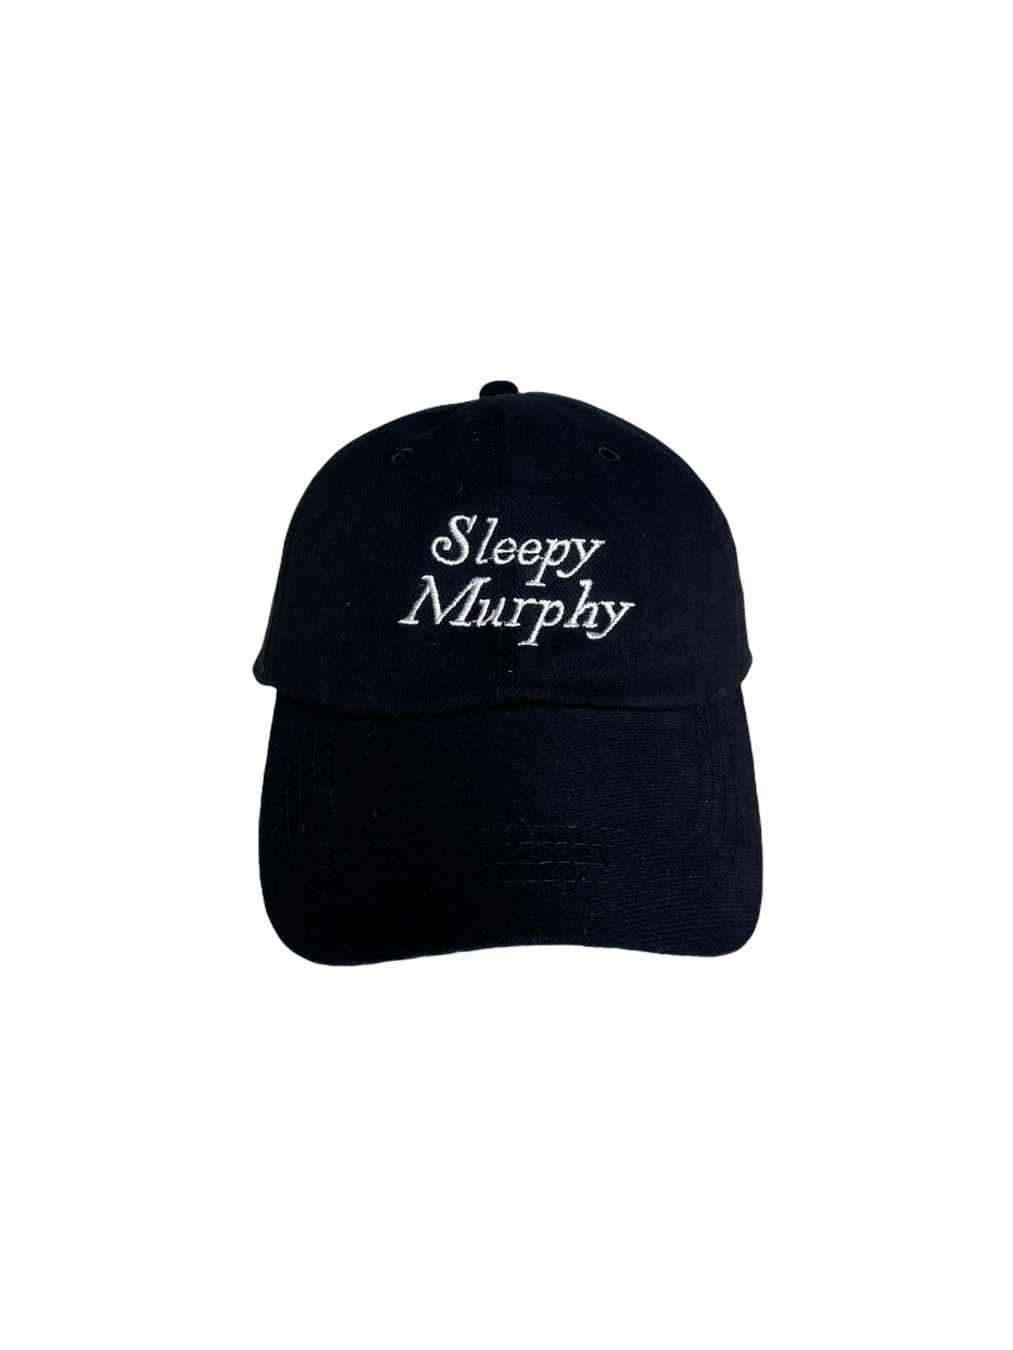 Murphy Cap (Black)